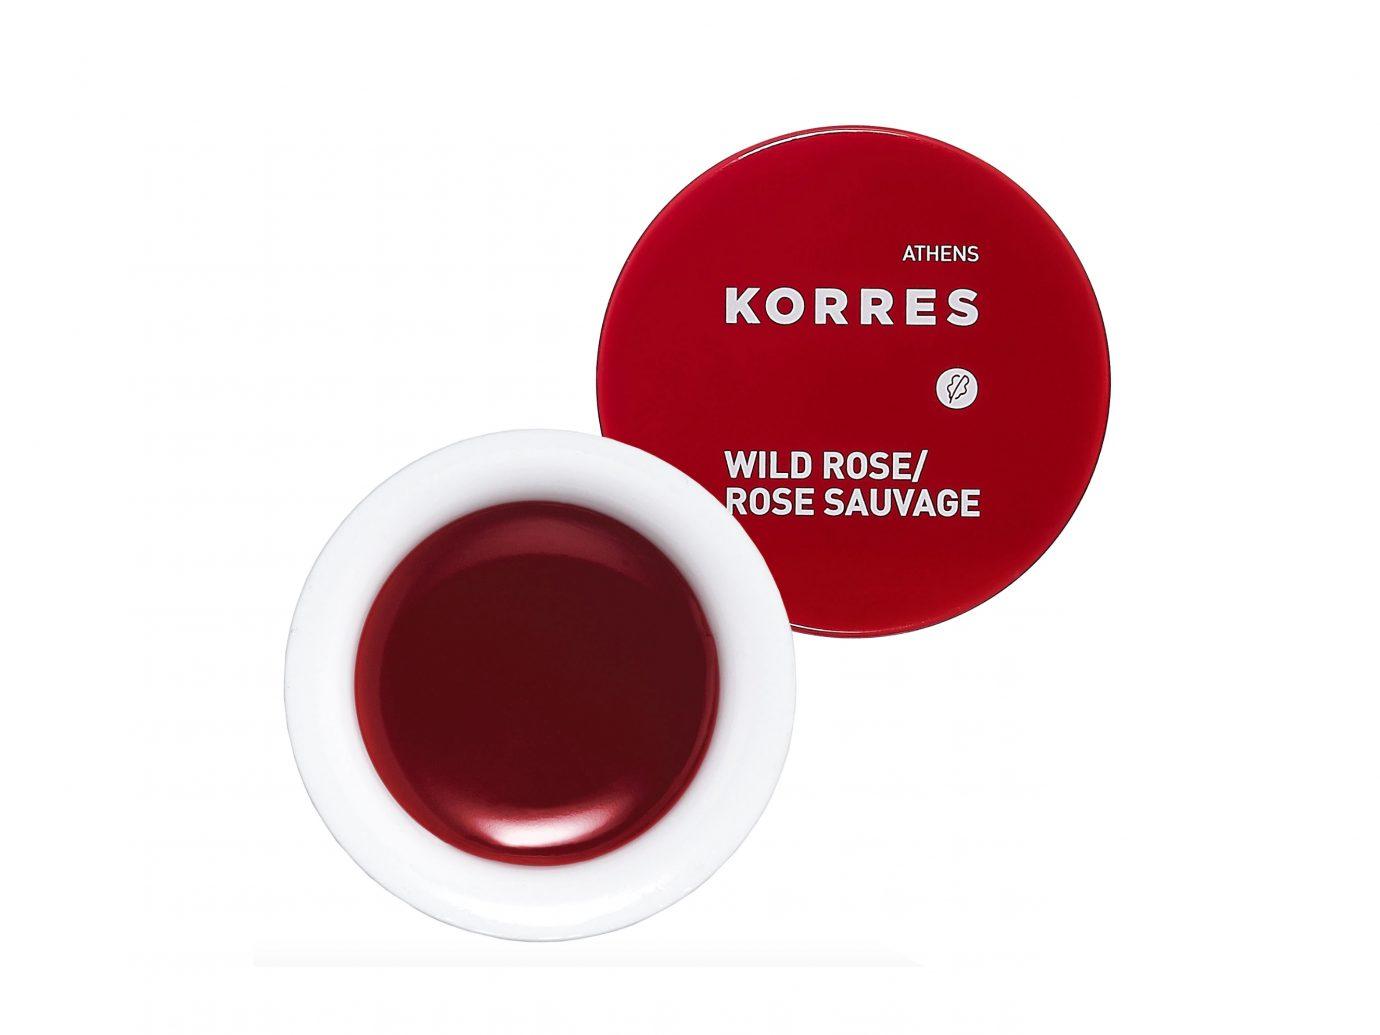 Korres Lip Butter in Wild Rose